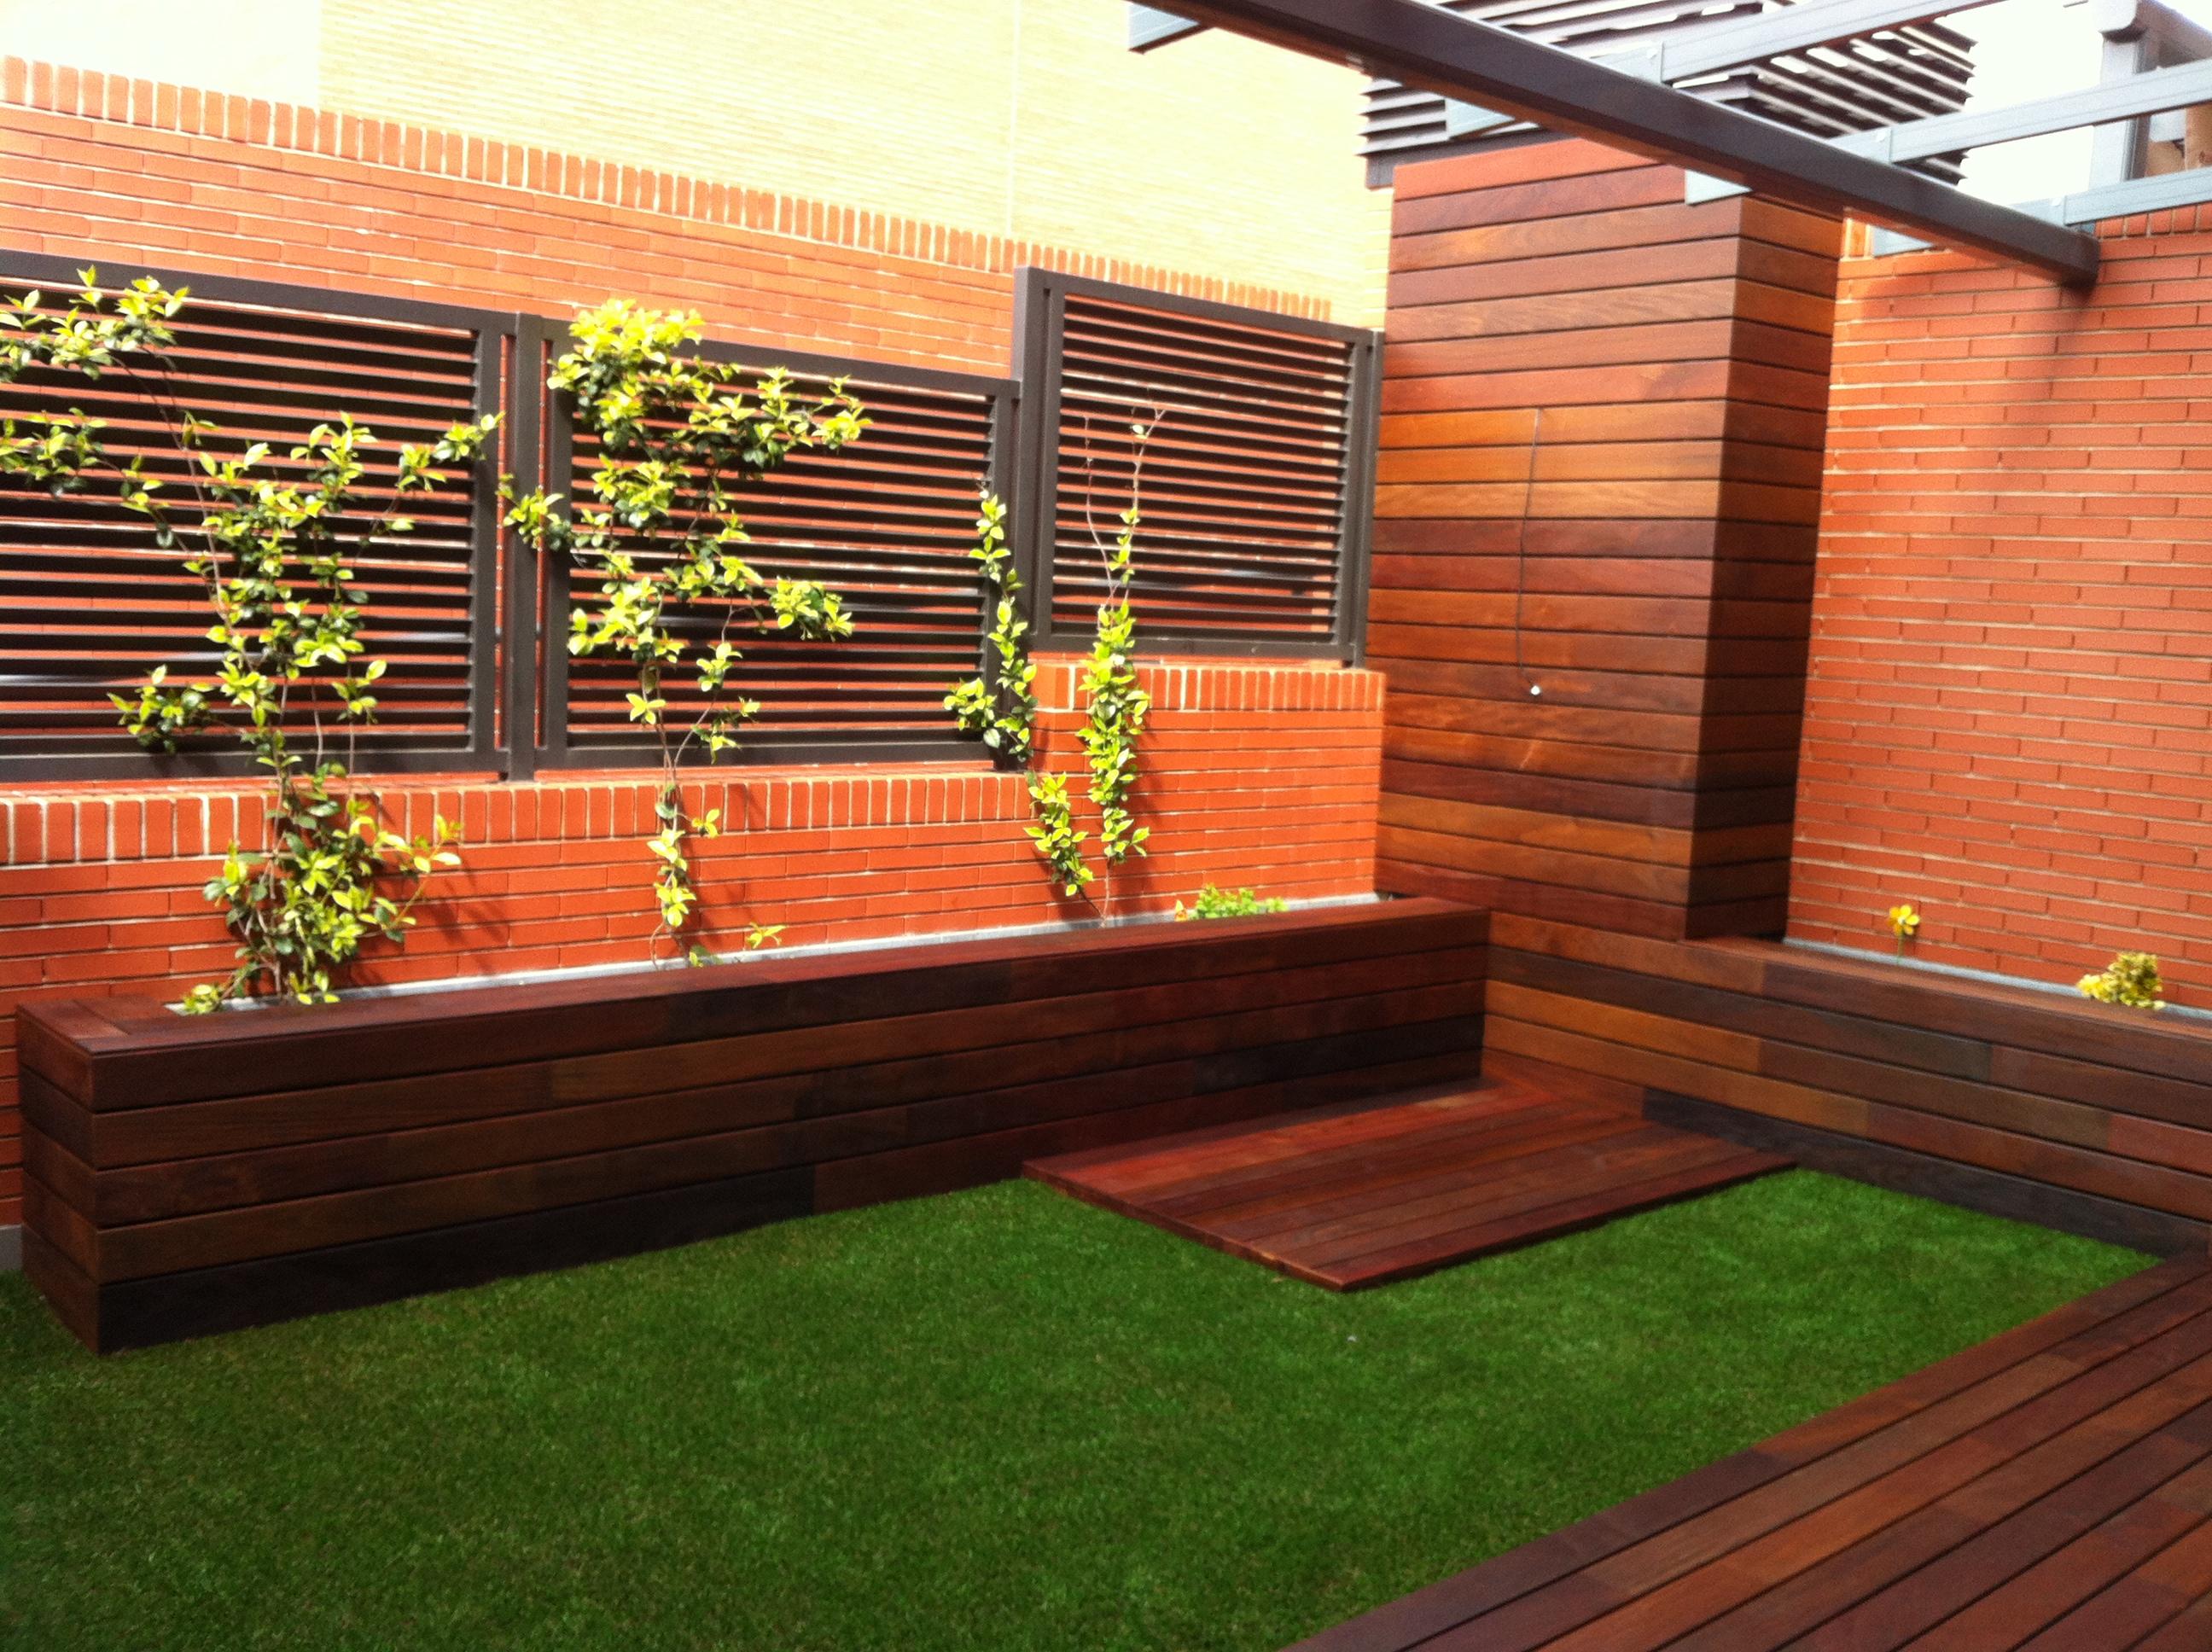 Suelos de madera exterior tarima de exterior tarima de for Suelos madera interior